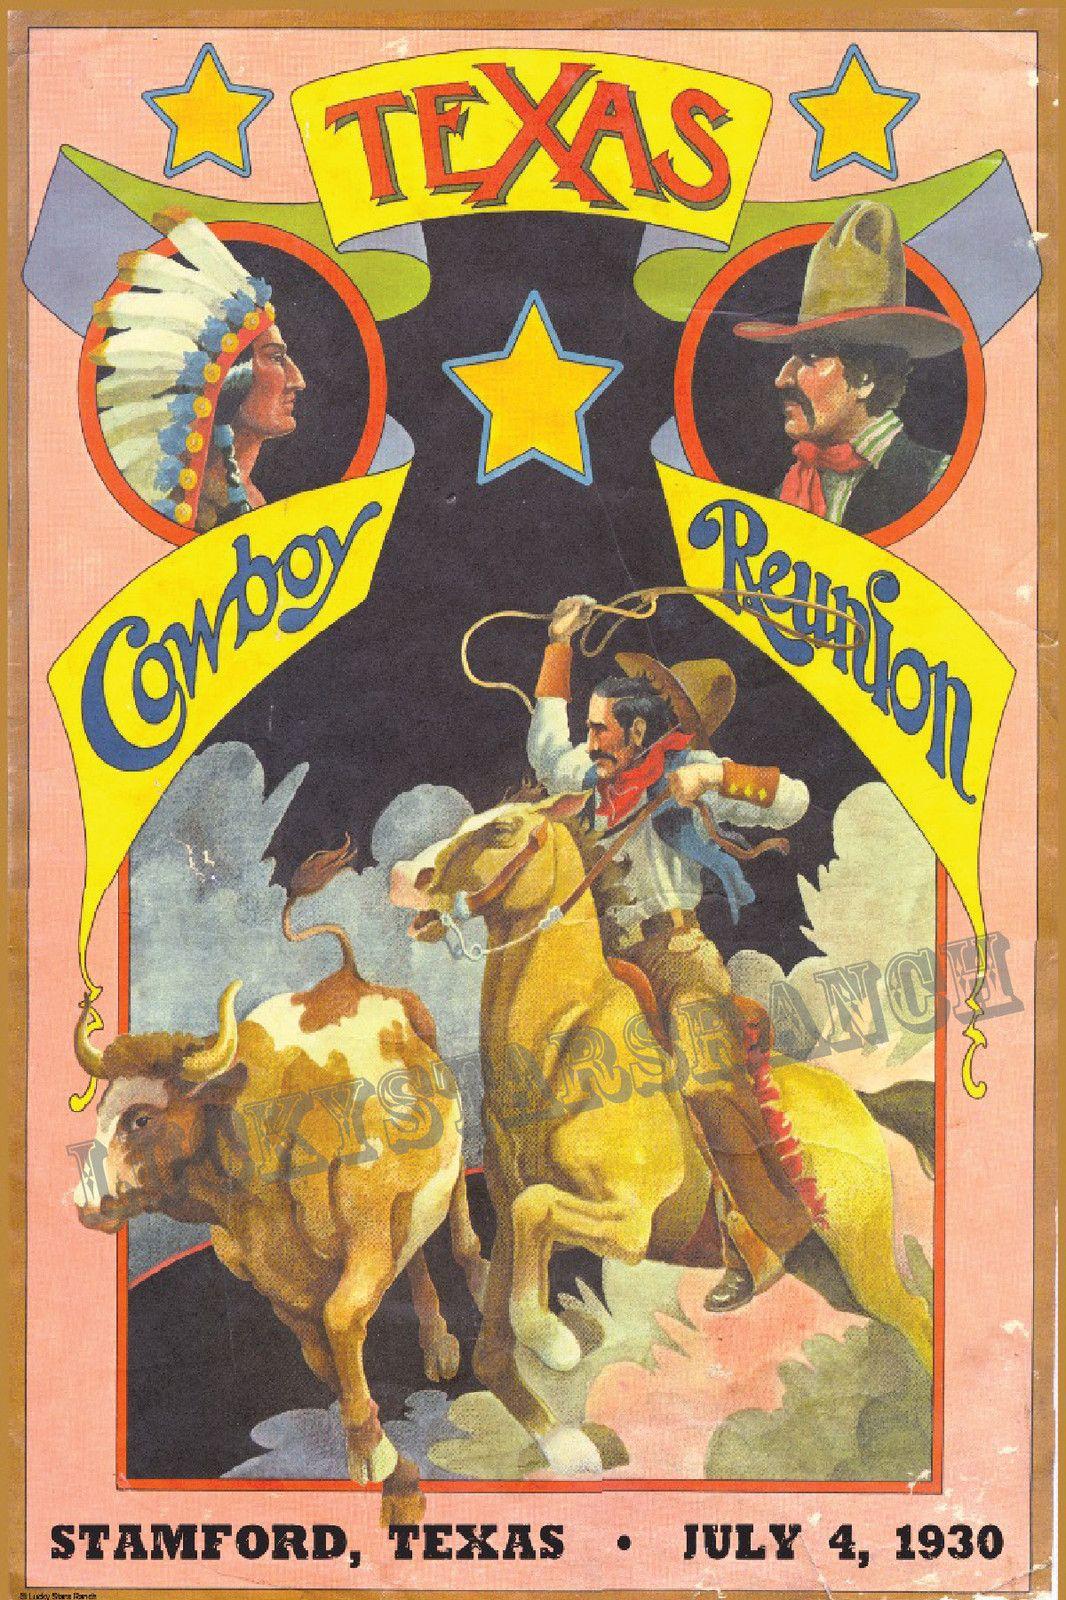 Cowboy Rodeo Poster Texas Cowboy Reunion 1930 Vintage